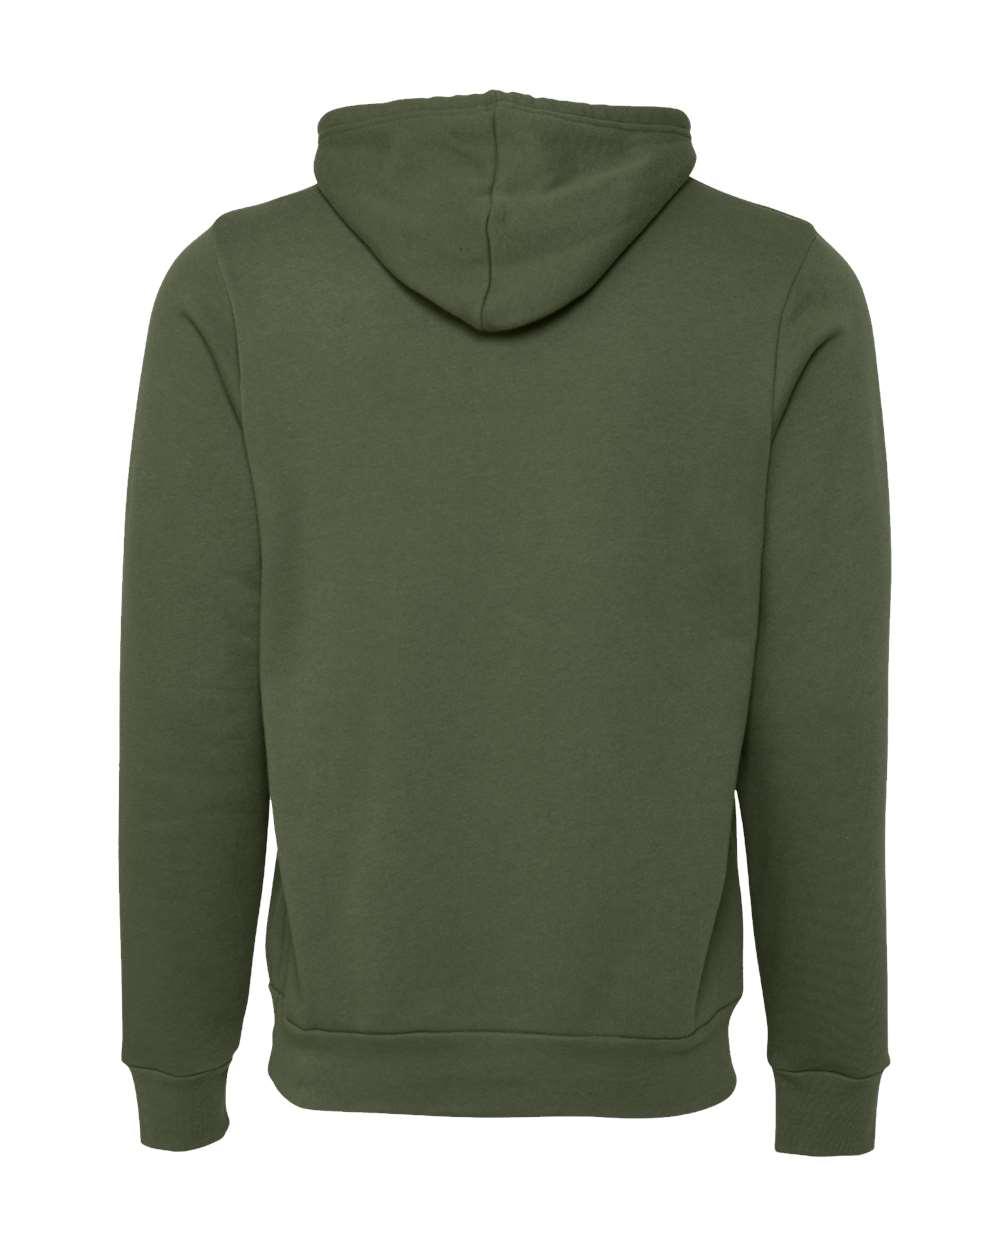 Bella-Canvas-Unisex-Sponge-Hooded-Pullover-Sweatshirt-Blank-3719-up-to-2XL thumbnail 77